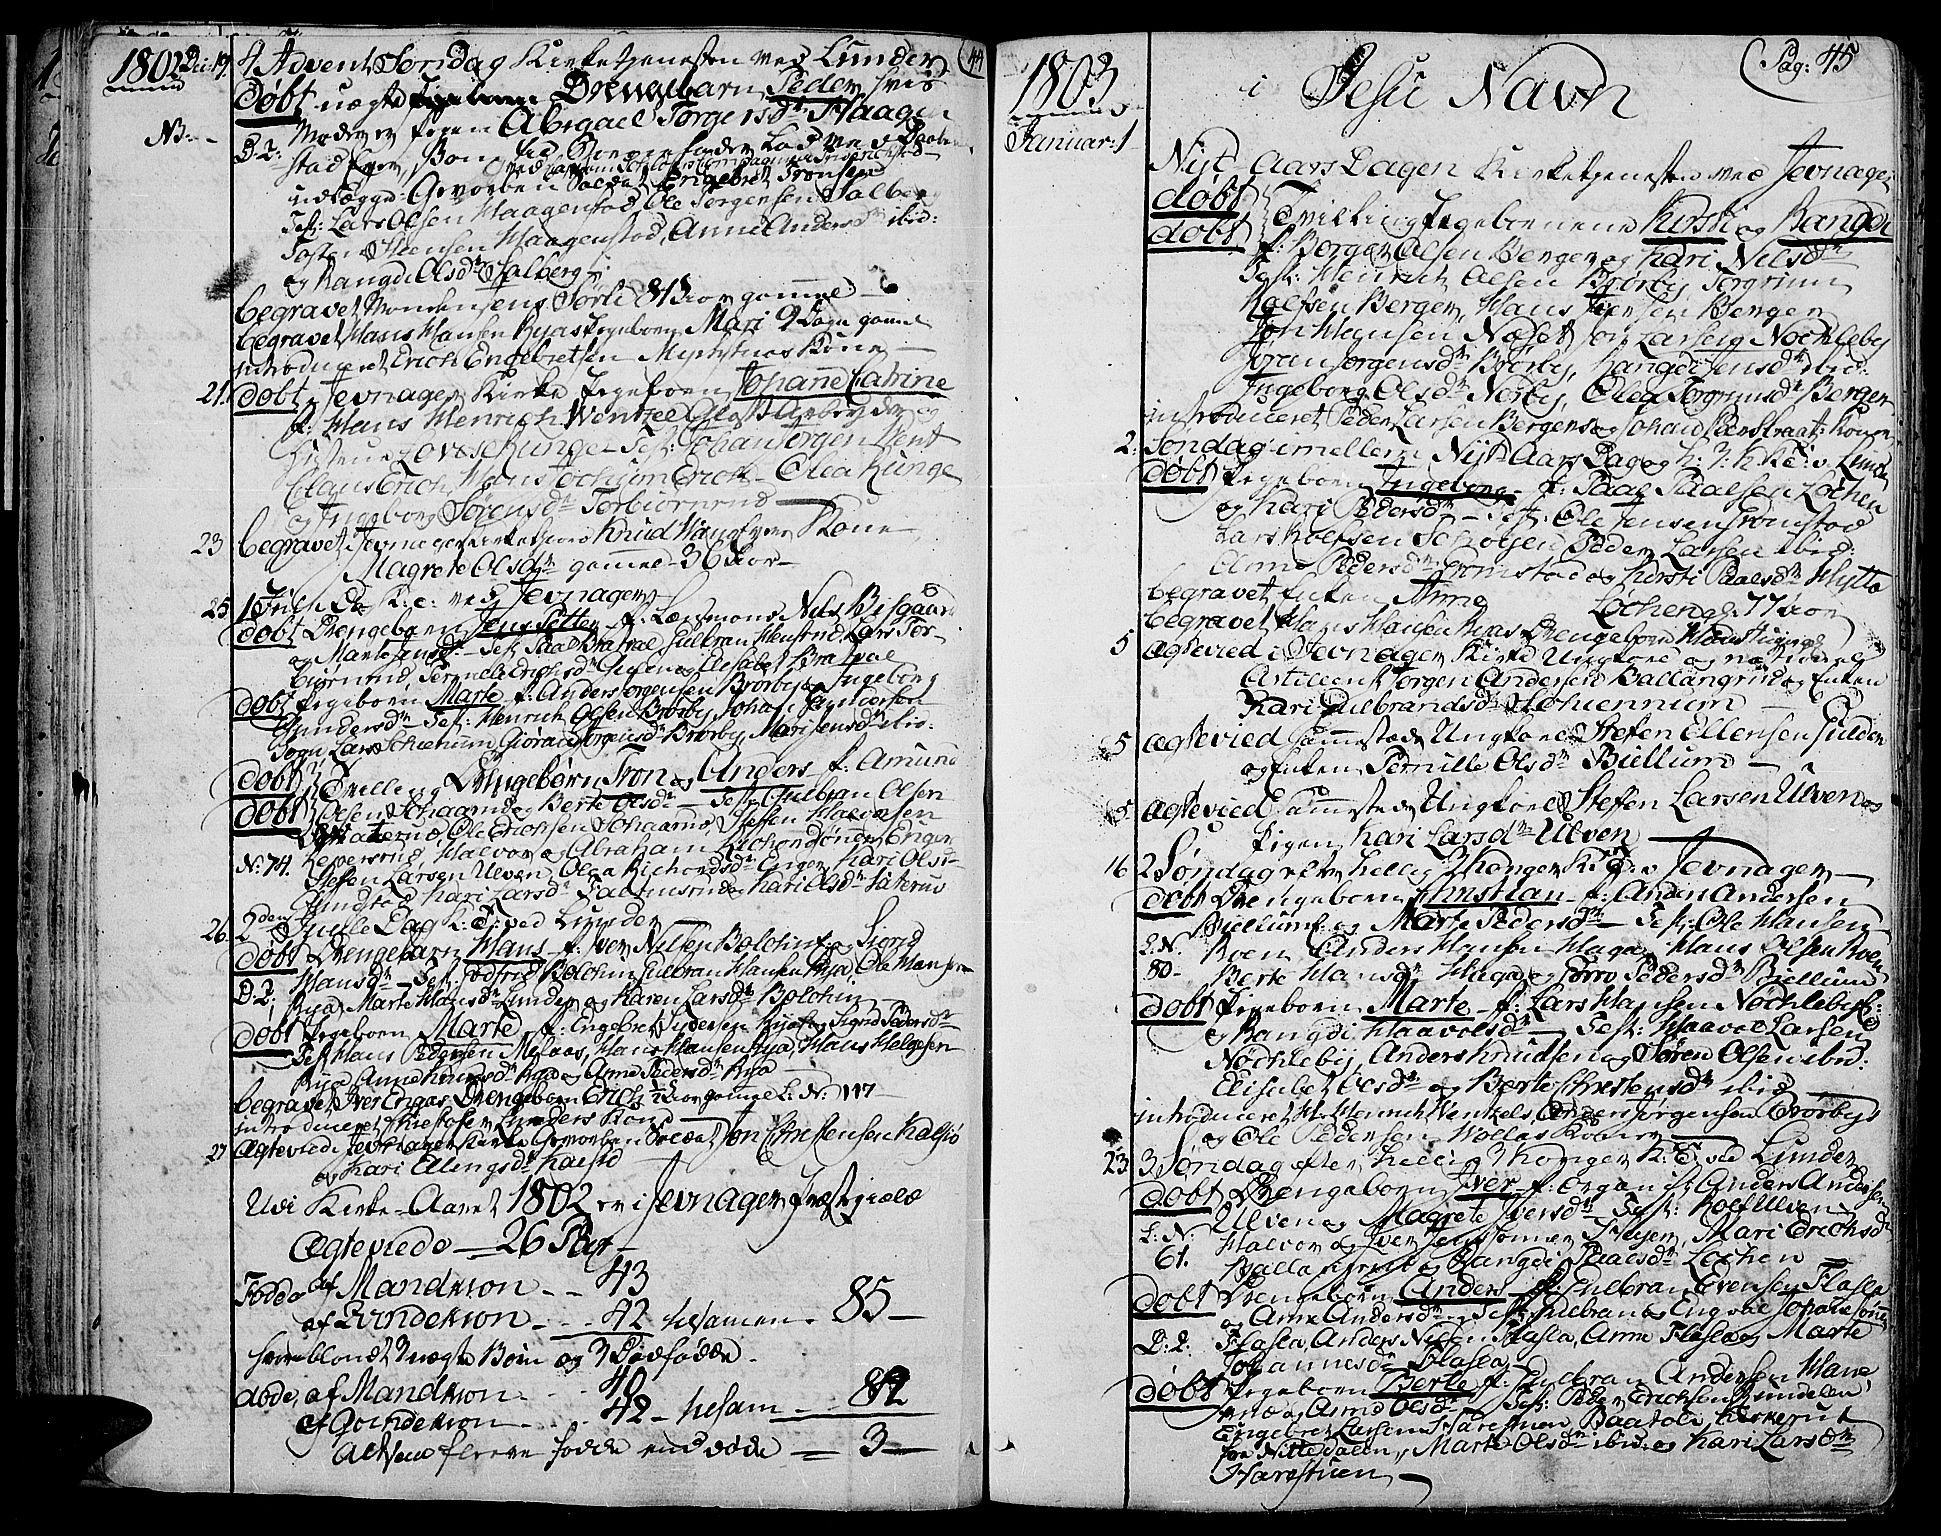 SAH, Jevnaker prestekontor, Ministerialbok nr. 4, 1800-1861, s. 44-45